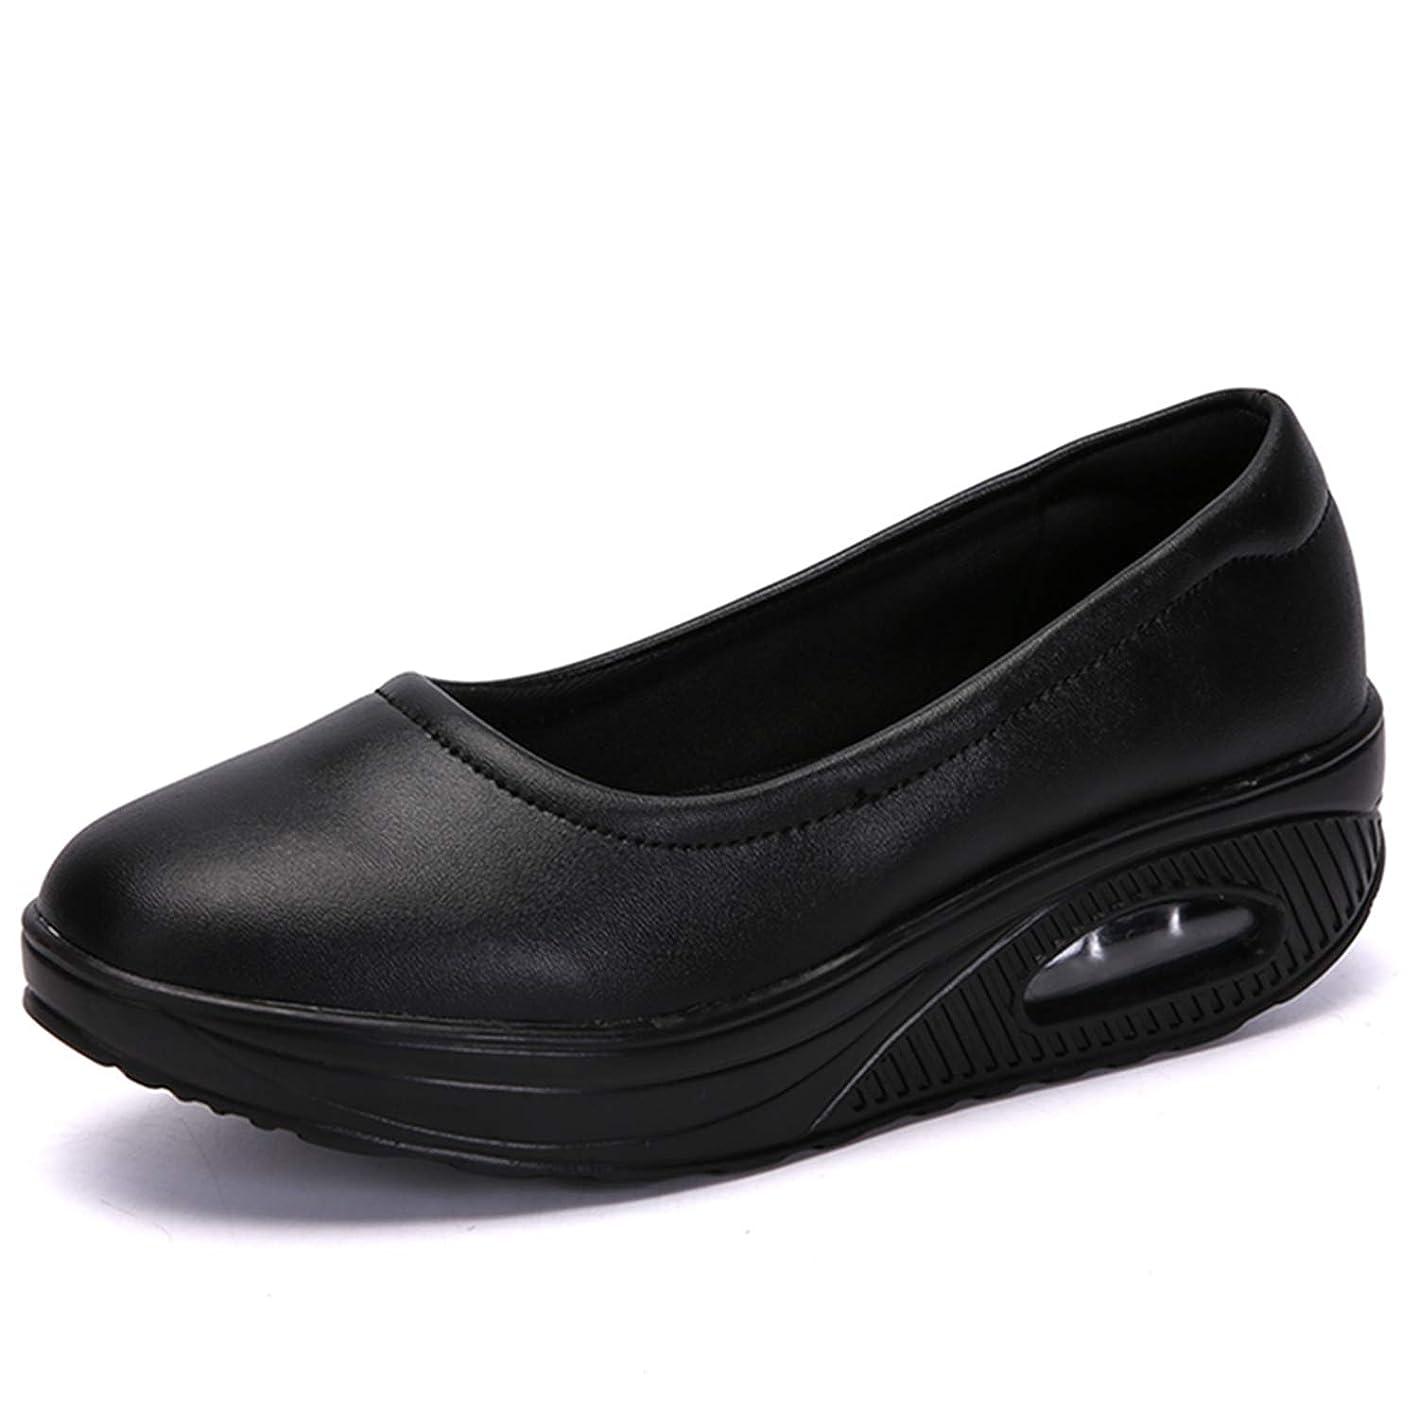 [Sunlane] レディース ナースシューズ スニーカー 厚底 ダイエットシューズ 安全靴 ナースシューズ 看護師 介護士 通気性 柔軟性 本革 通気 エアクッション付き お母さん 婦人靴 軽量 スボーツスニーカー